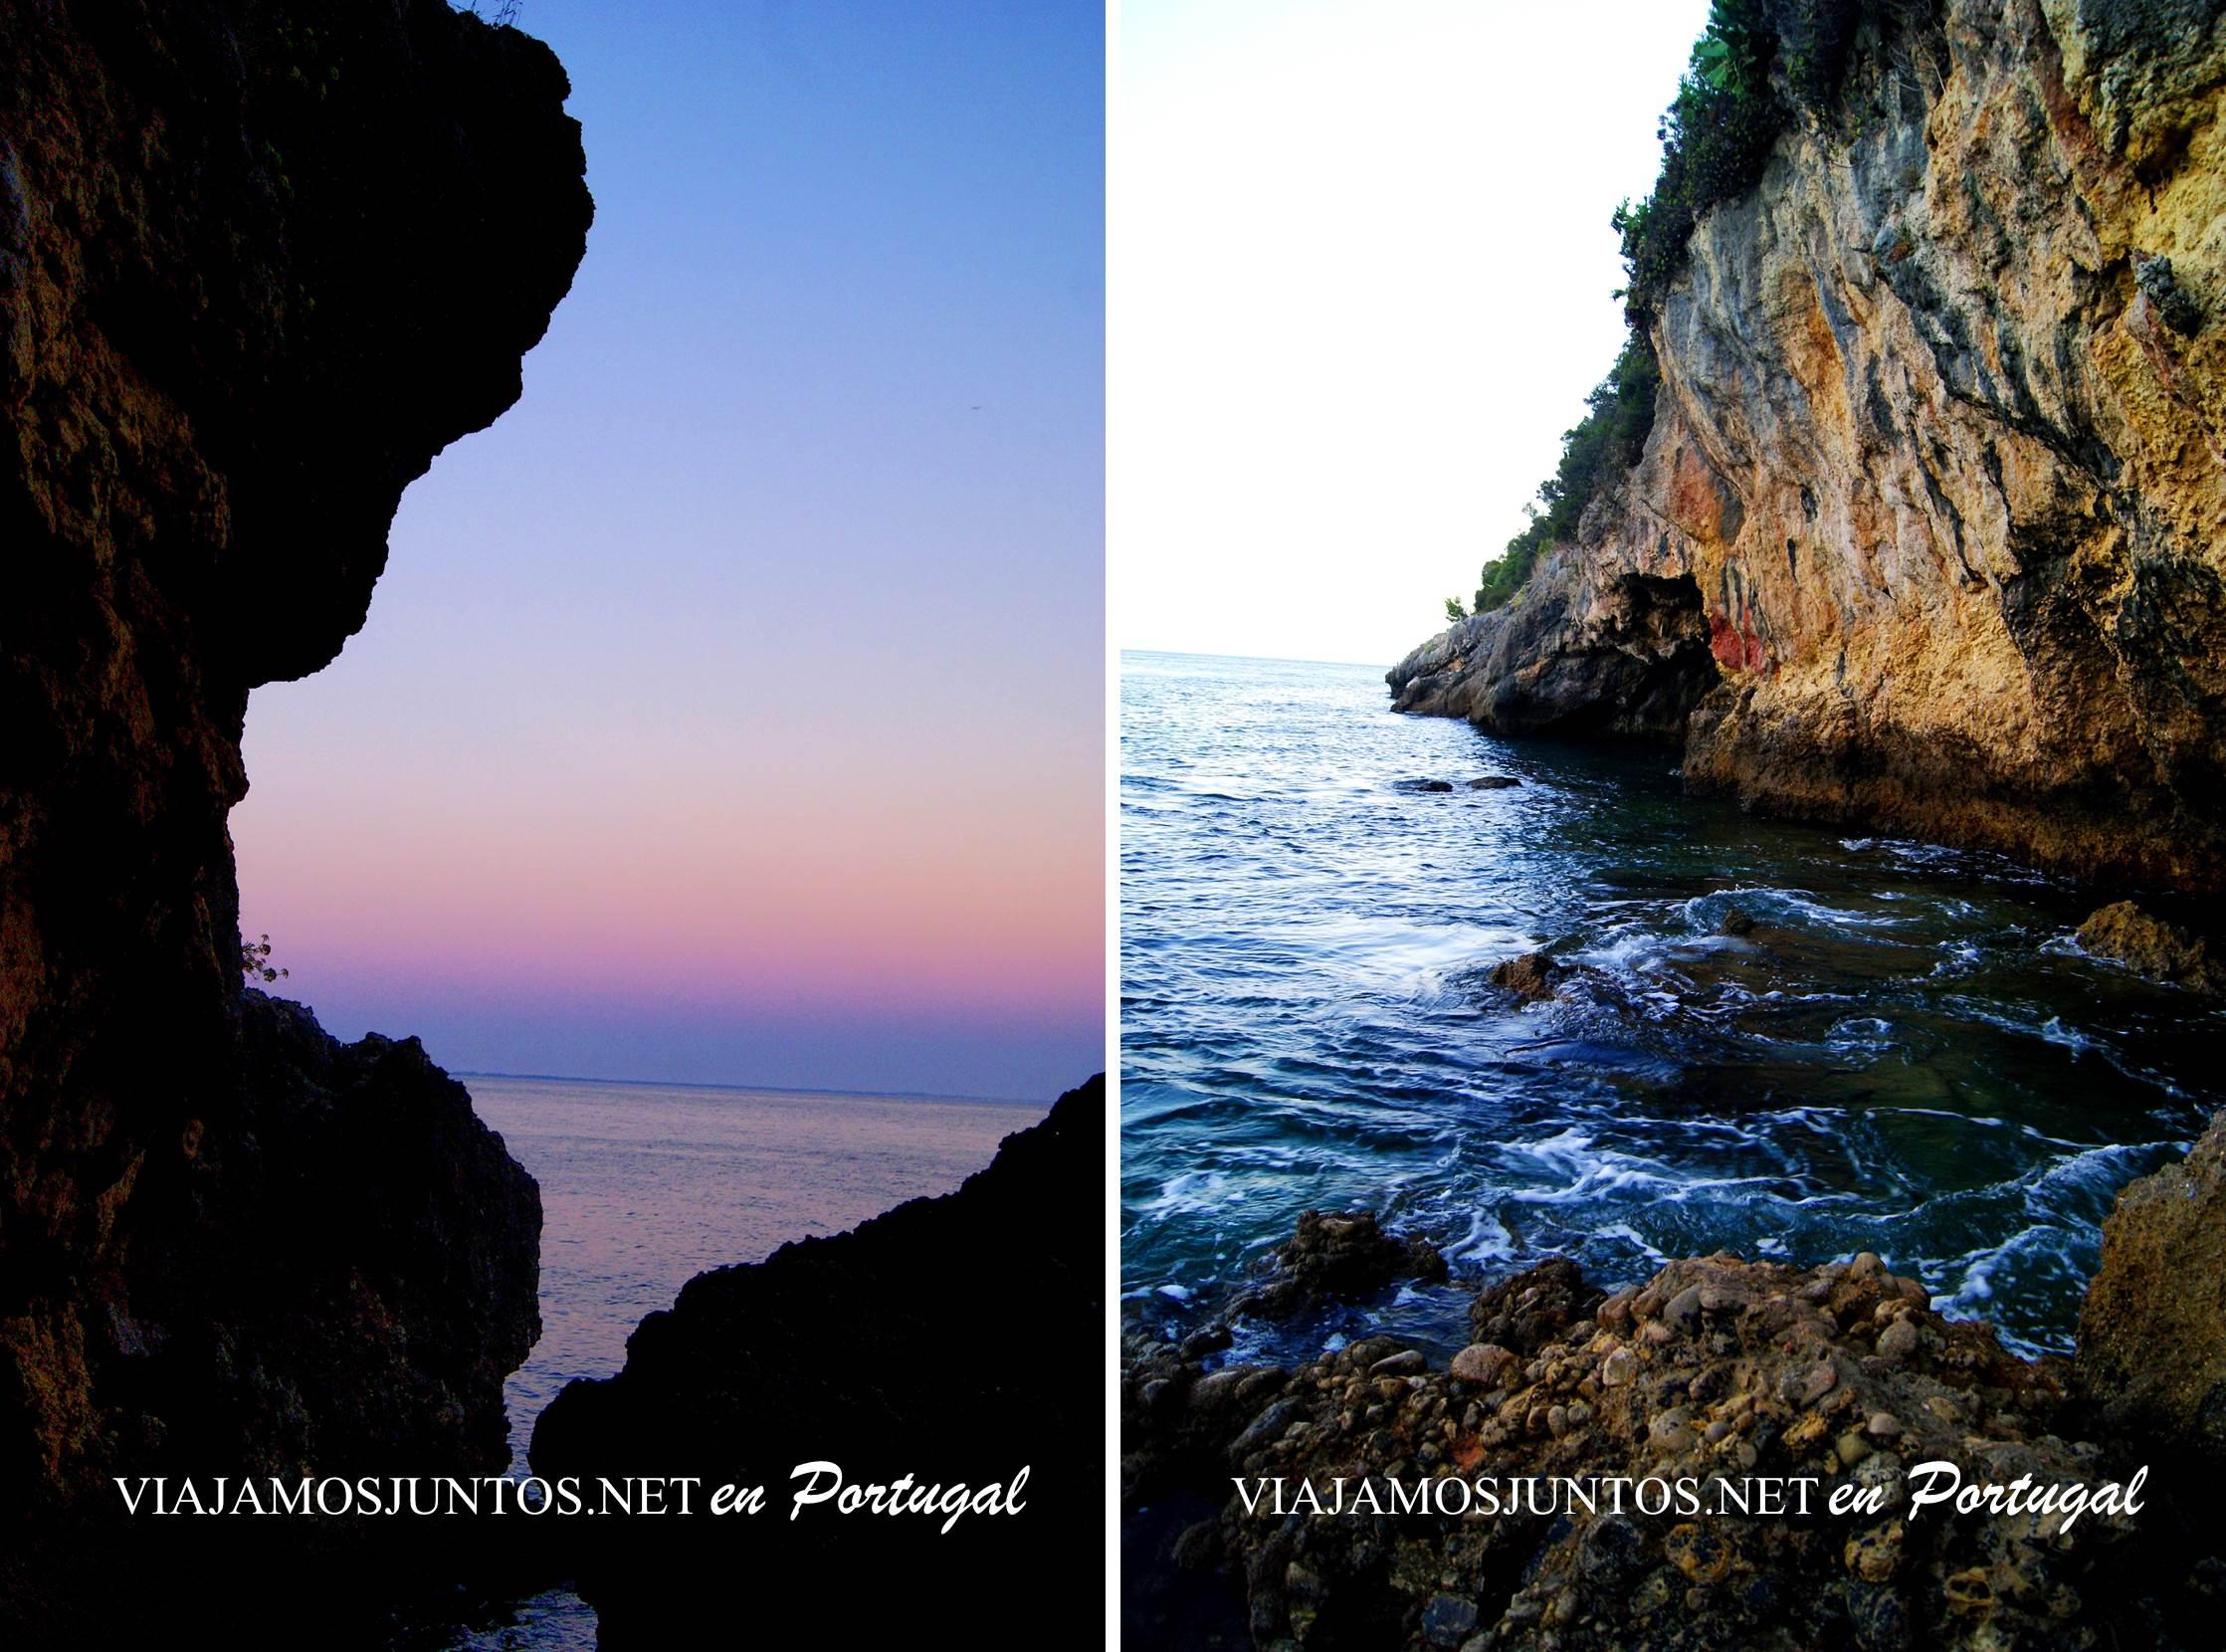 Salida al mar desde la Gruta de Santa Margarida, Península de Setúbal, Portugal